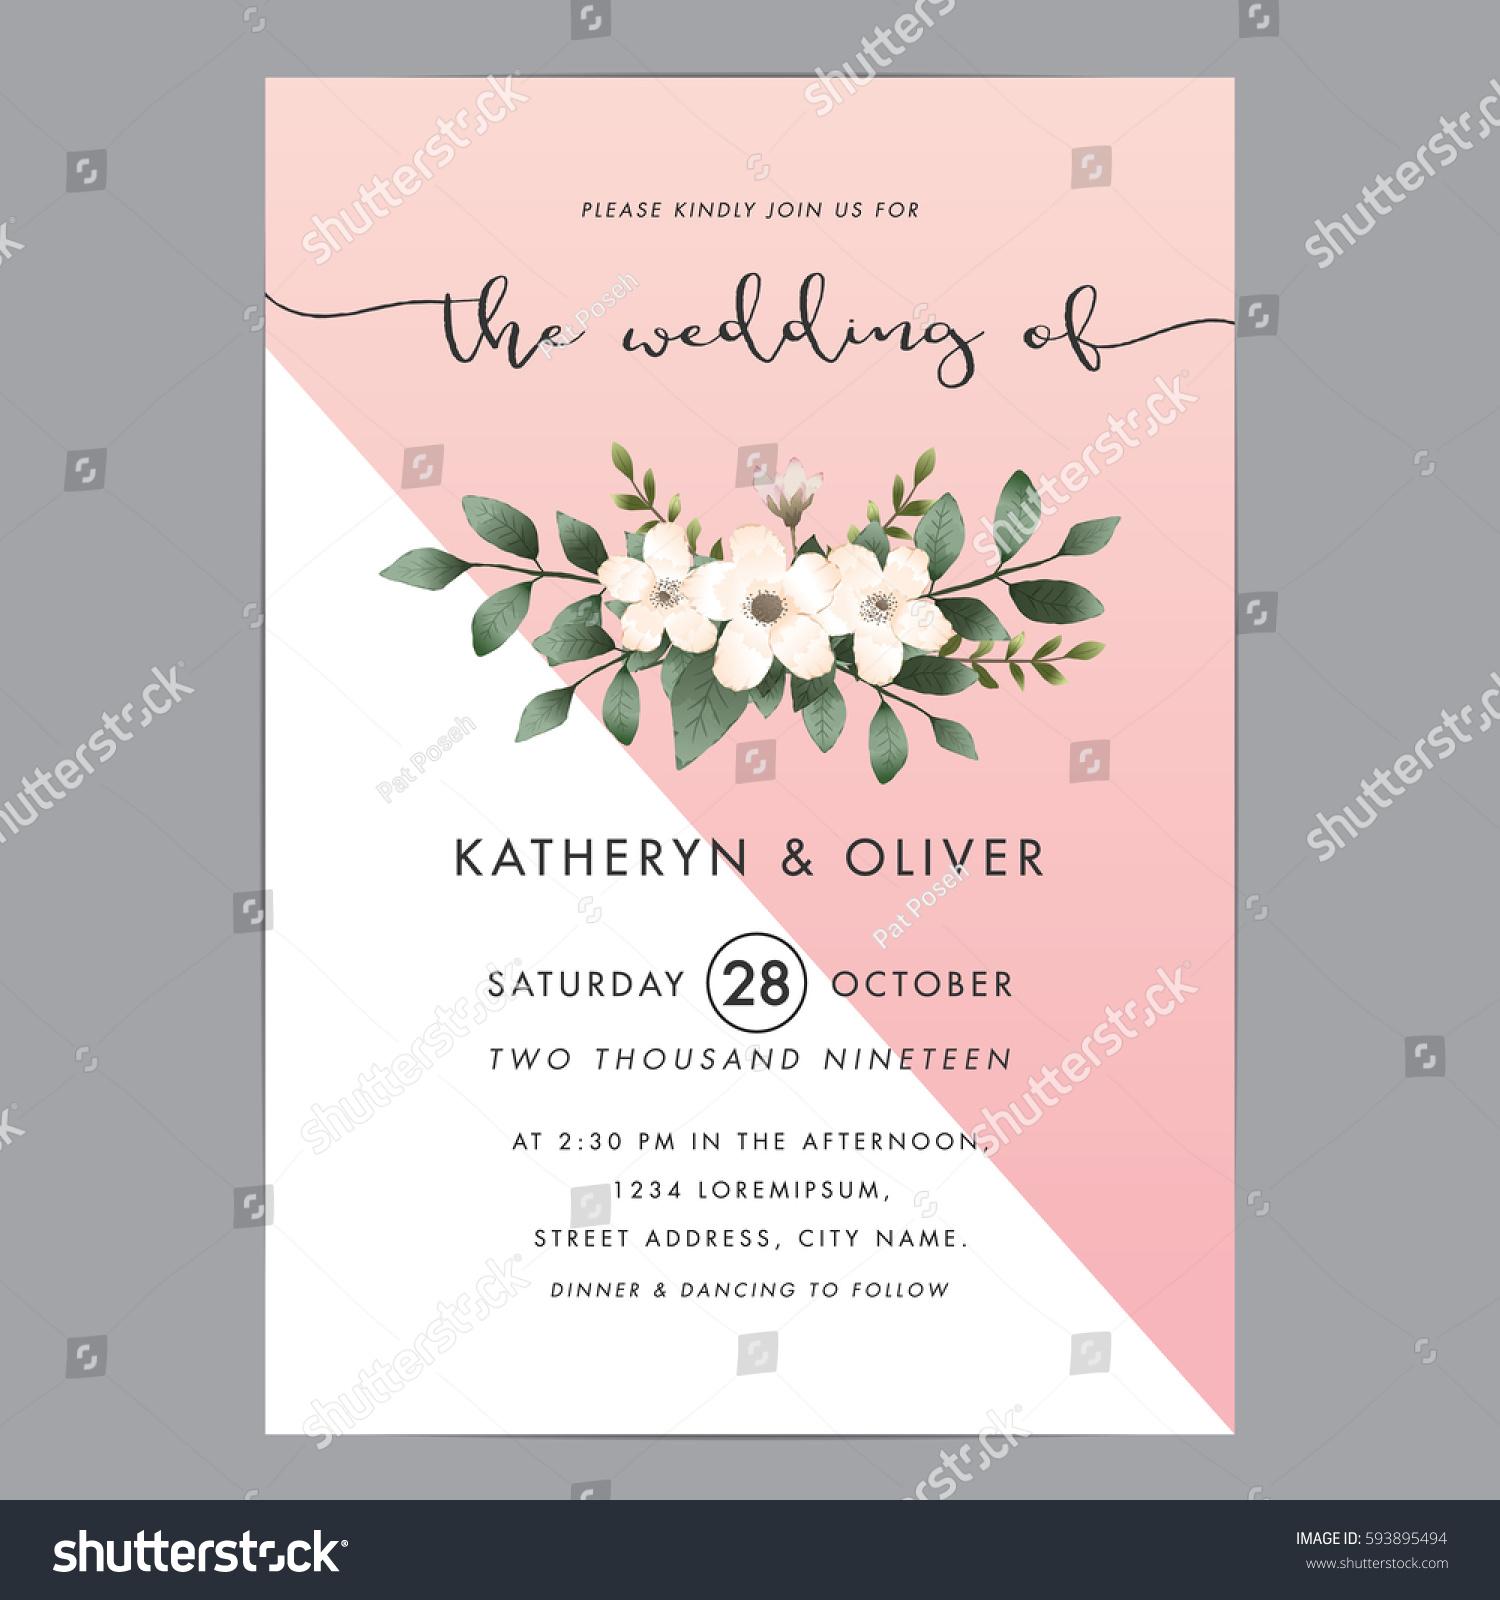 Modern clean wedding invitation card template stock photo photo modern and clean wedding invitation card template with bouquet flower vector illustration stopboris Images